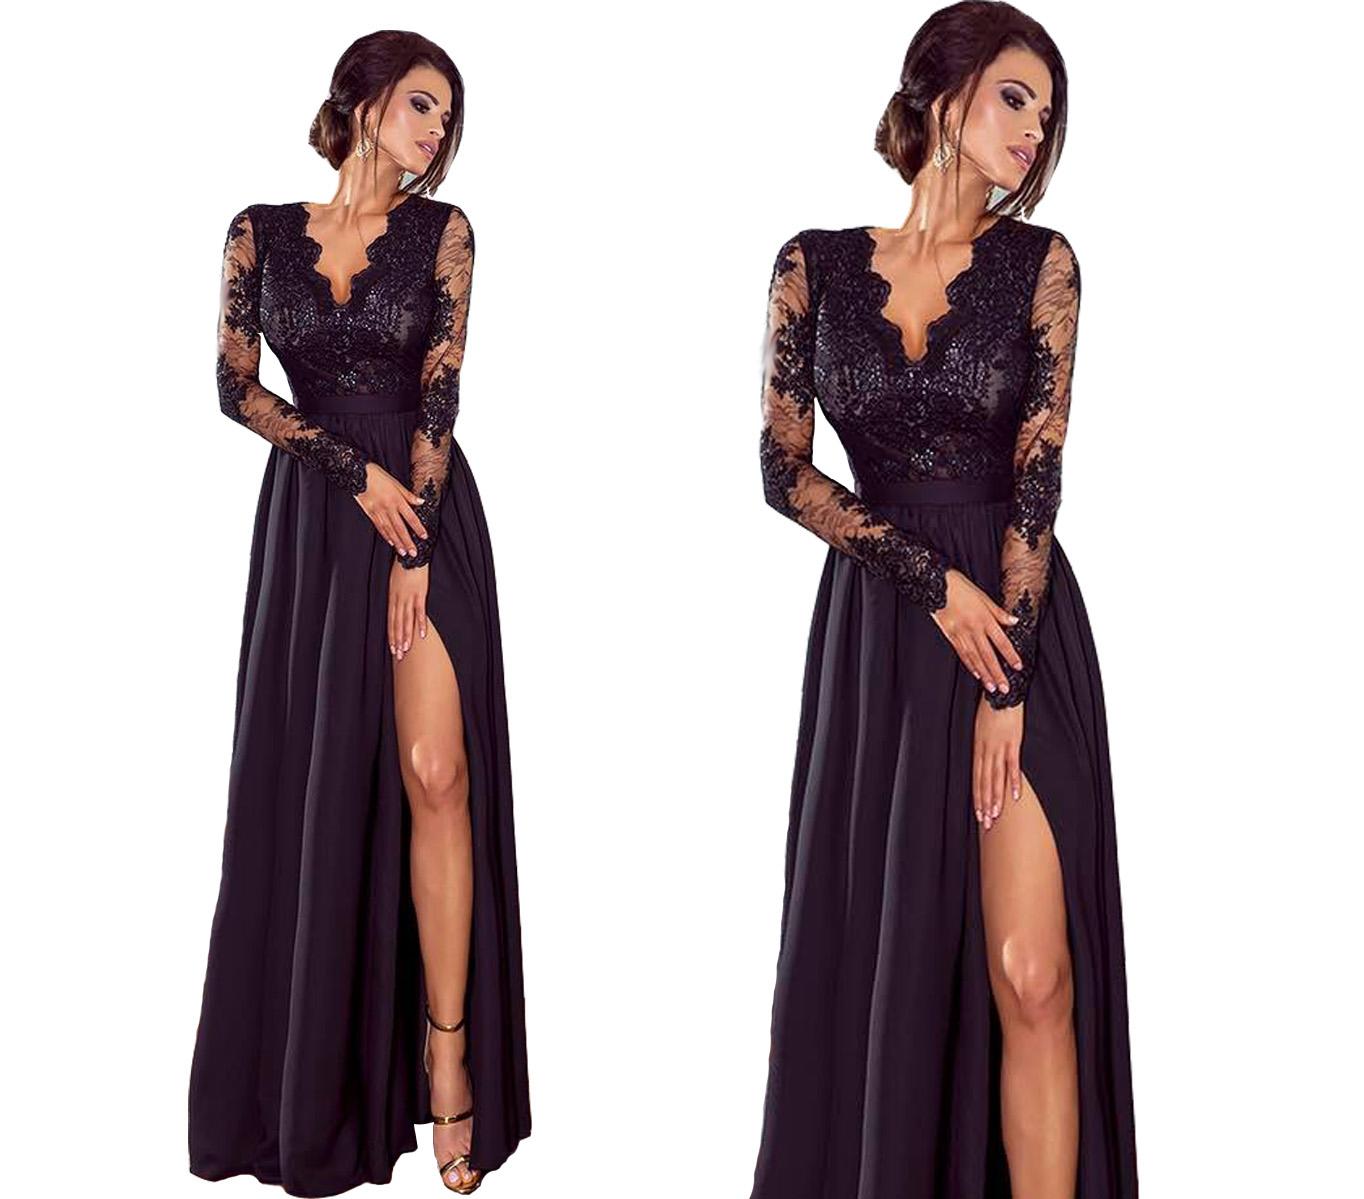 0782ecc6d8 Sukienka wieczorowa elegancka długa 44